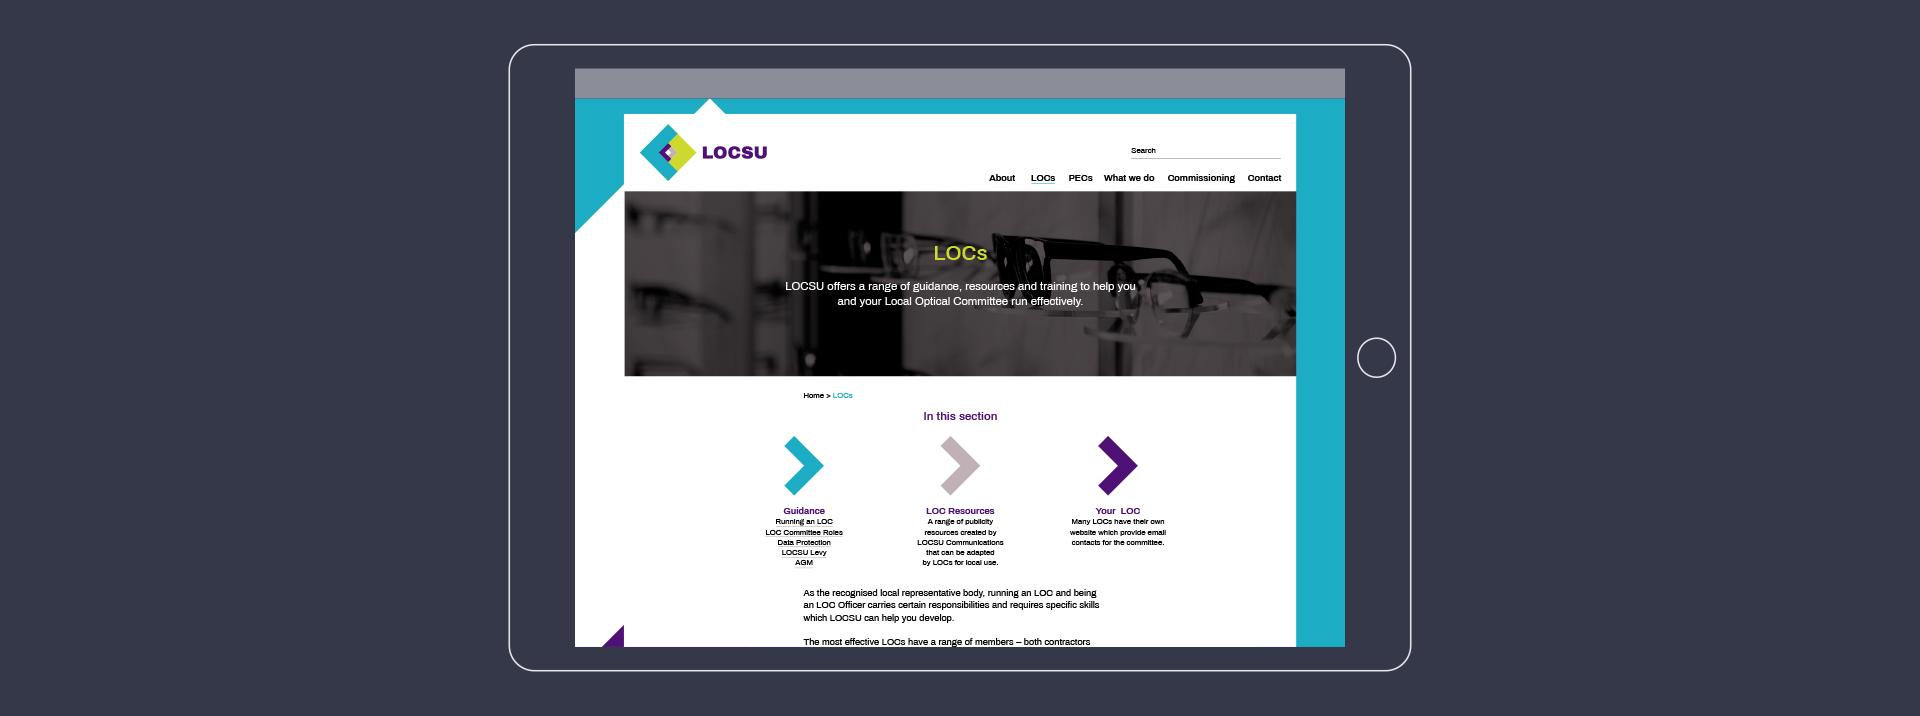 LOCSU website design